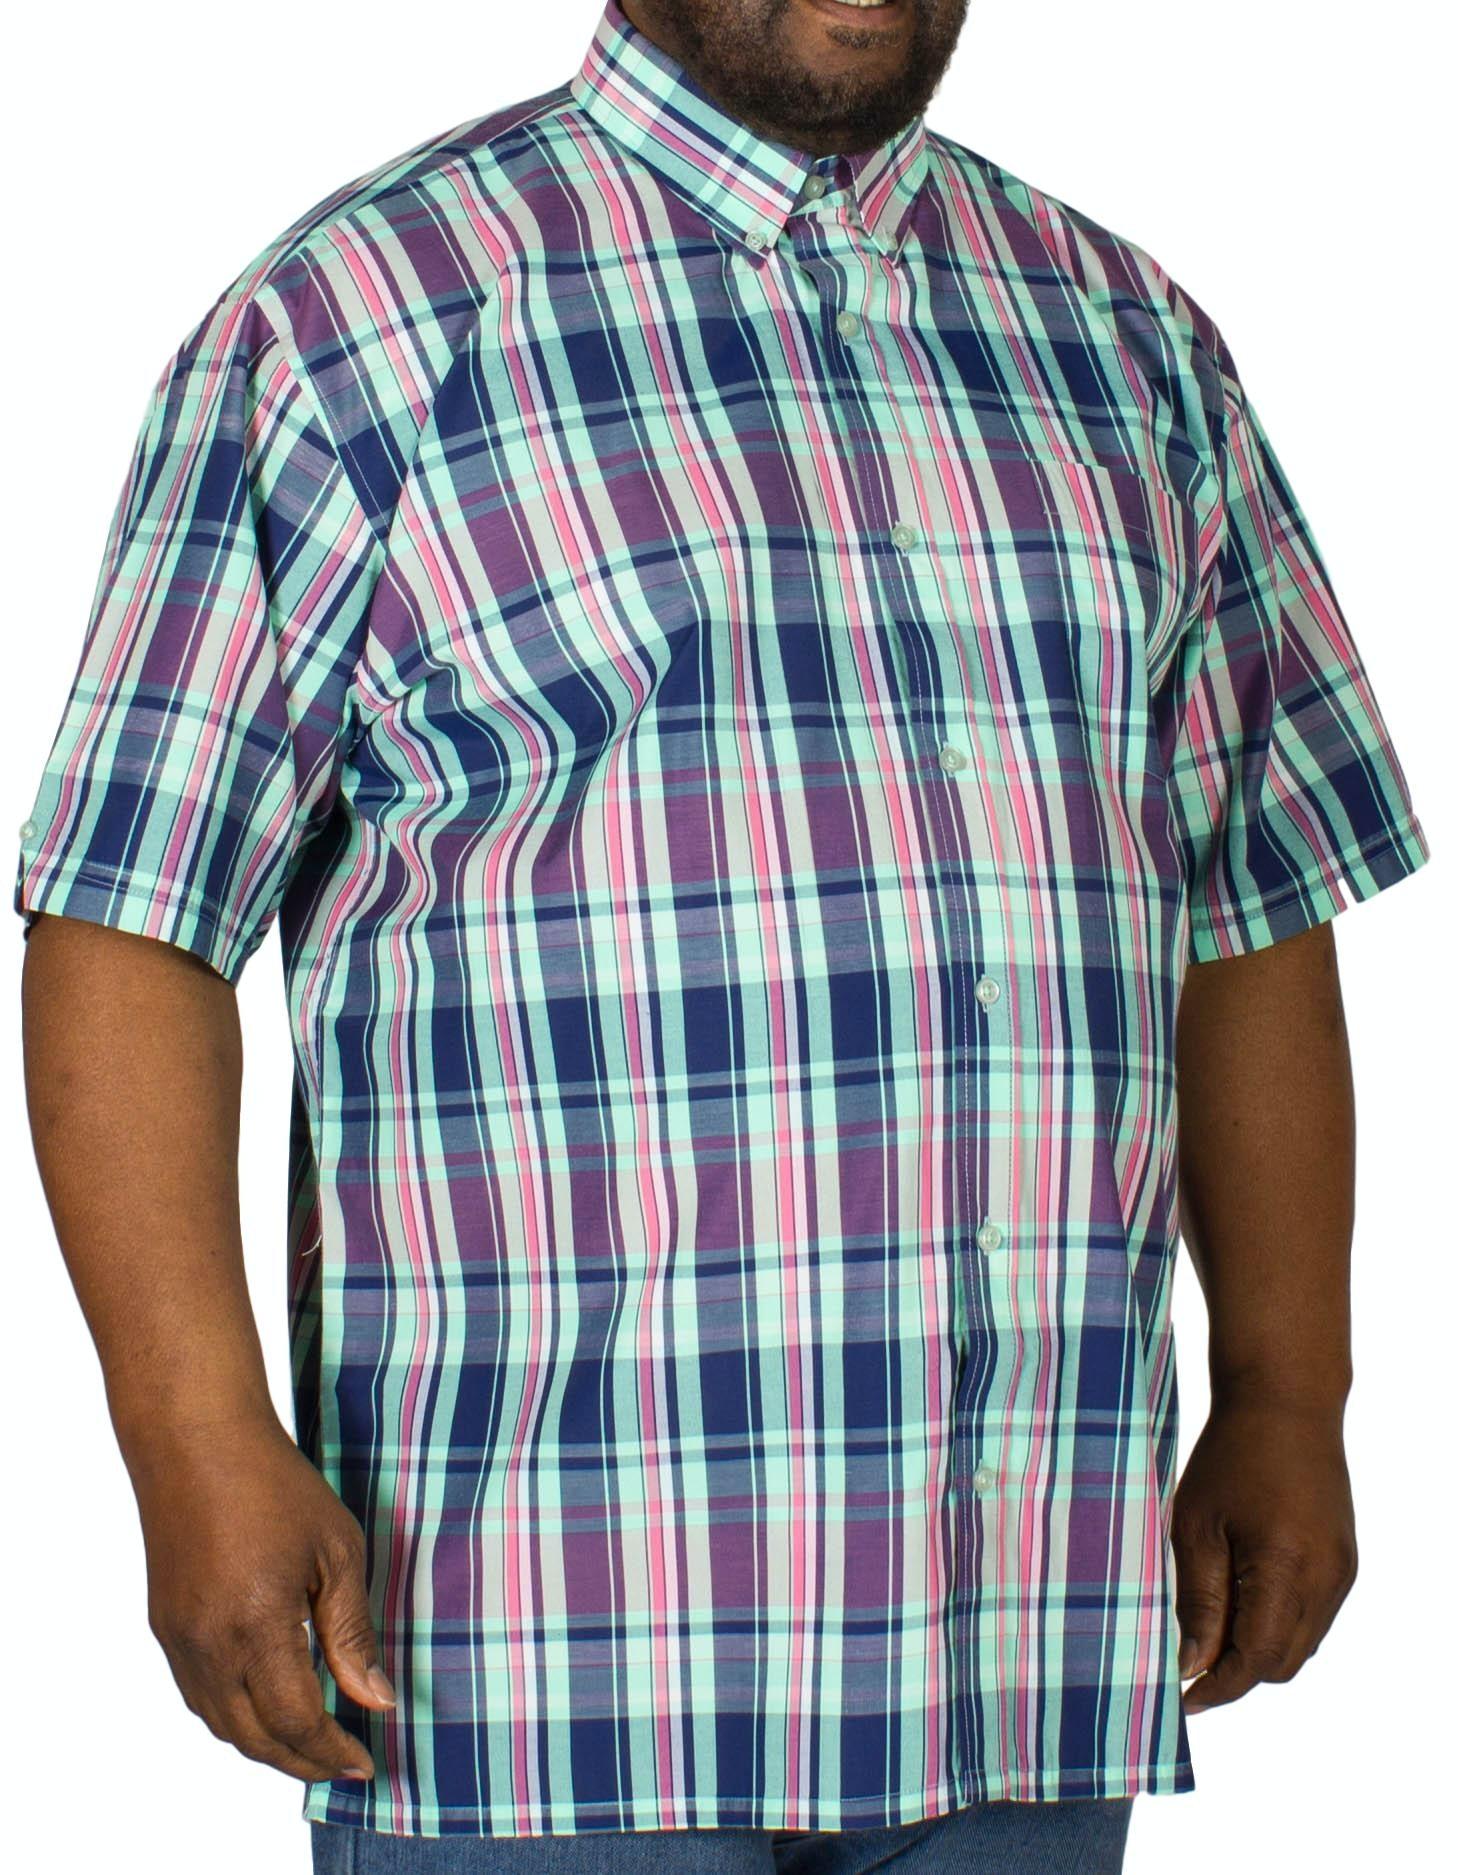 Espionage Check Short Sleeve Shirt Navy/Mint/Pink